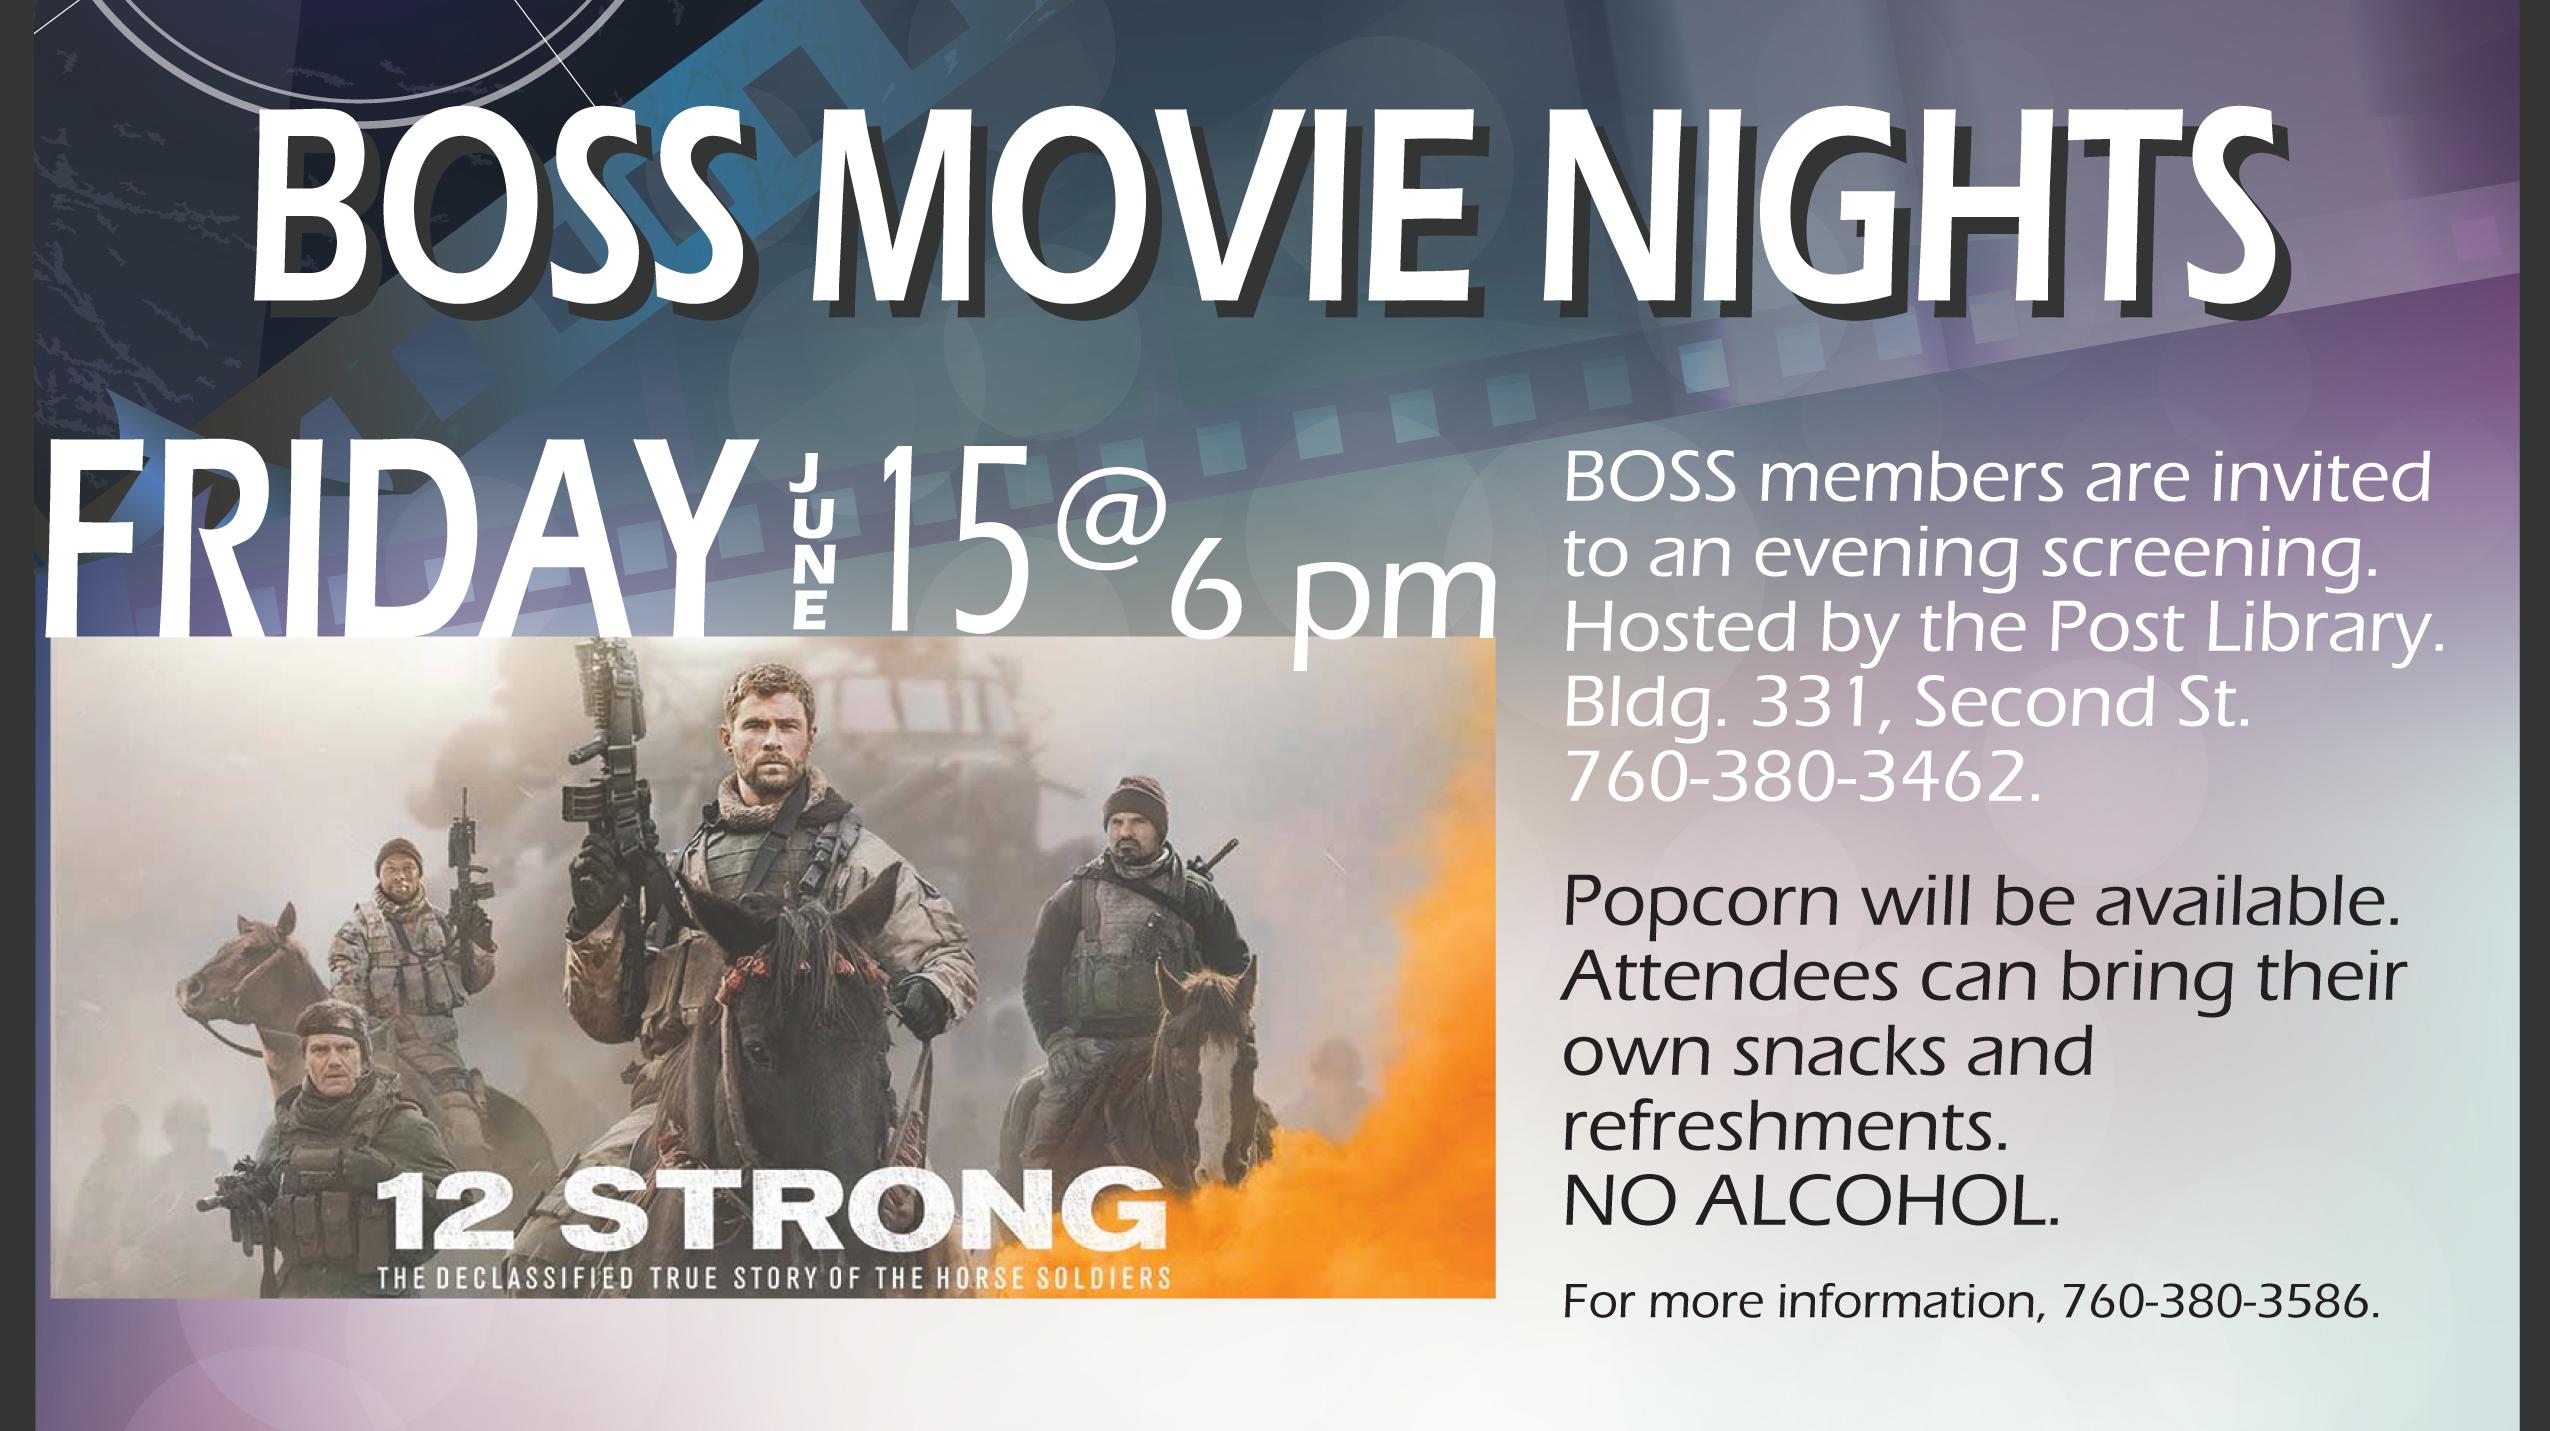 BOSS Movie Nights - 12 Strong